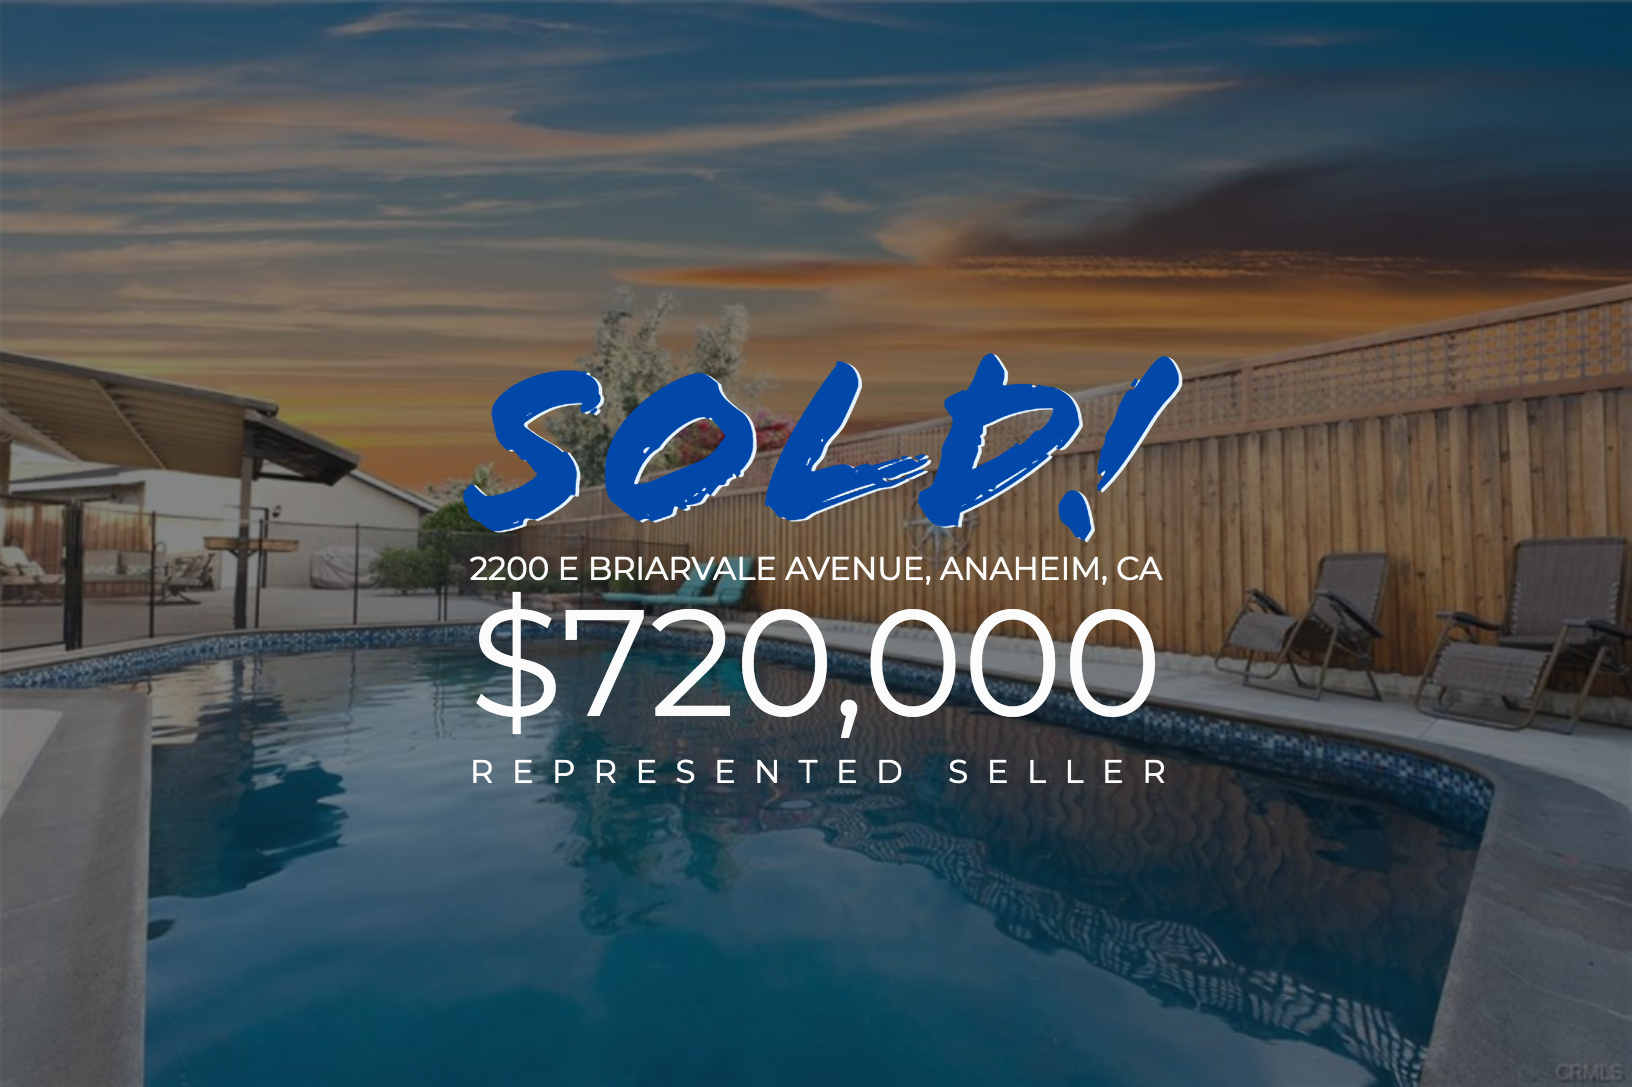 Sold With Matt Blashaw 2200 E Briarvale Avenue in Anaheim, CA